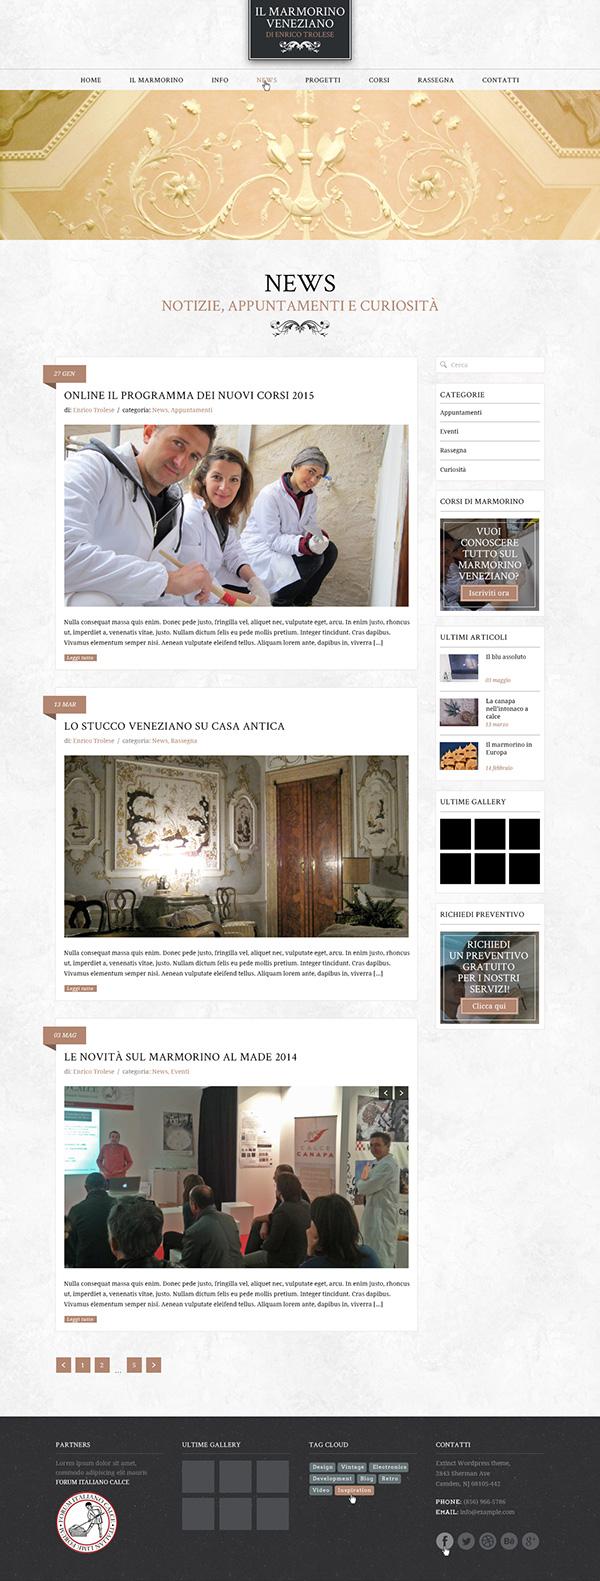 marmorino Venice artwork plaster stucco Web Website design Project Freelance